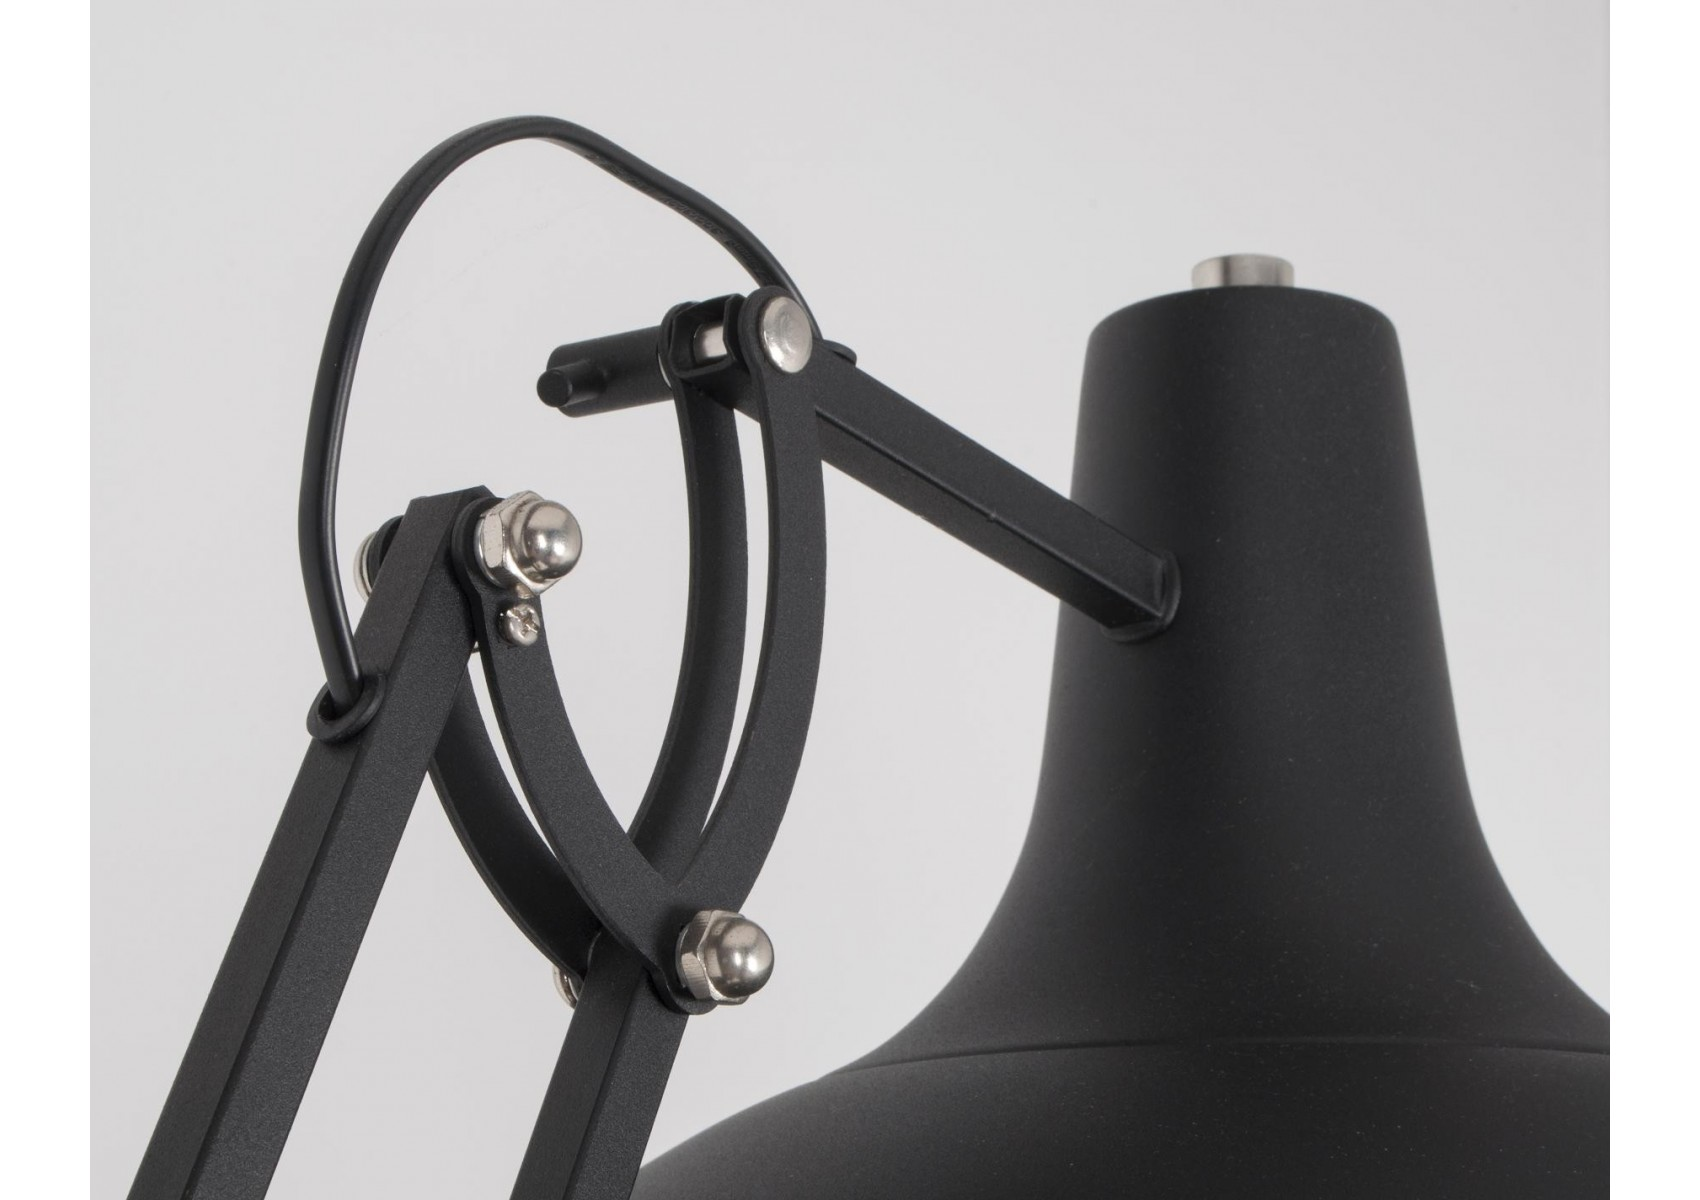 Lampadaire design look industriel articulé XXL - OFFICE - deco zuiver ...